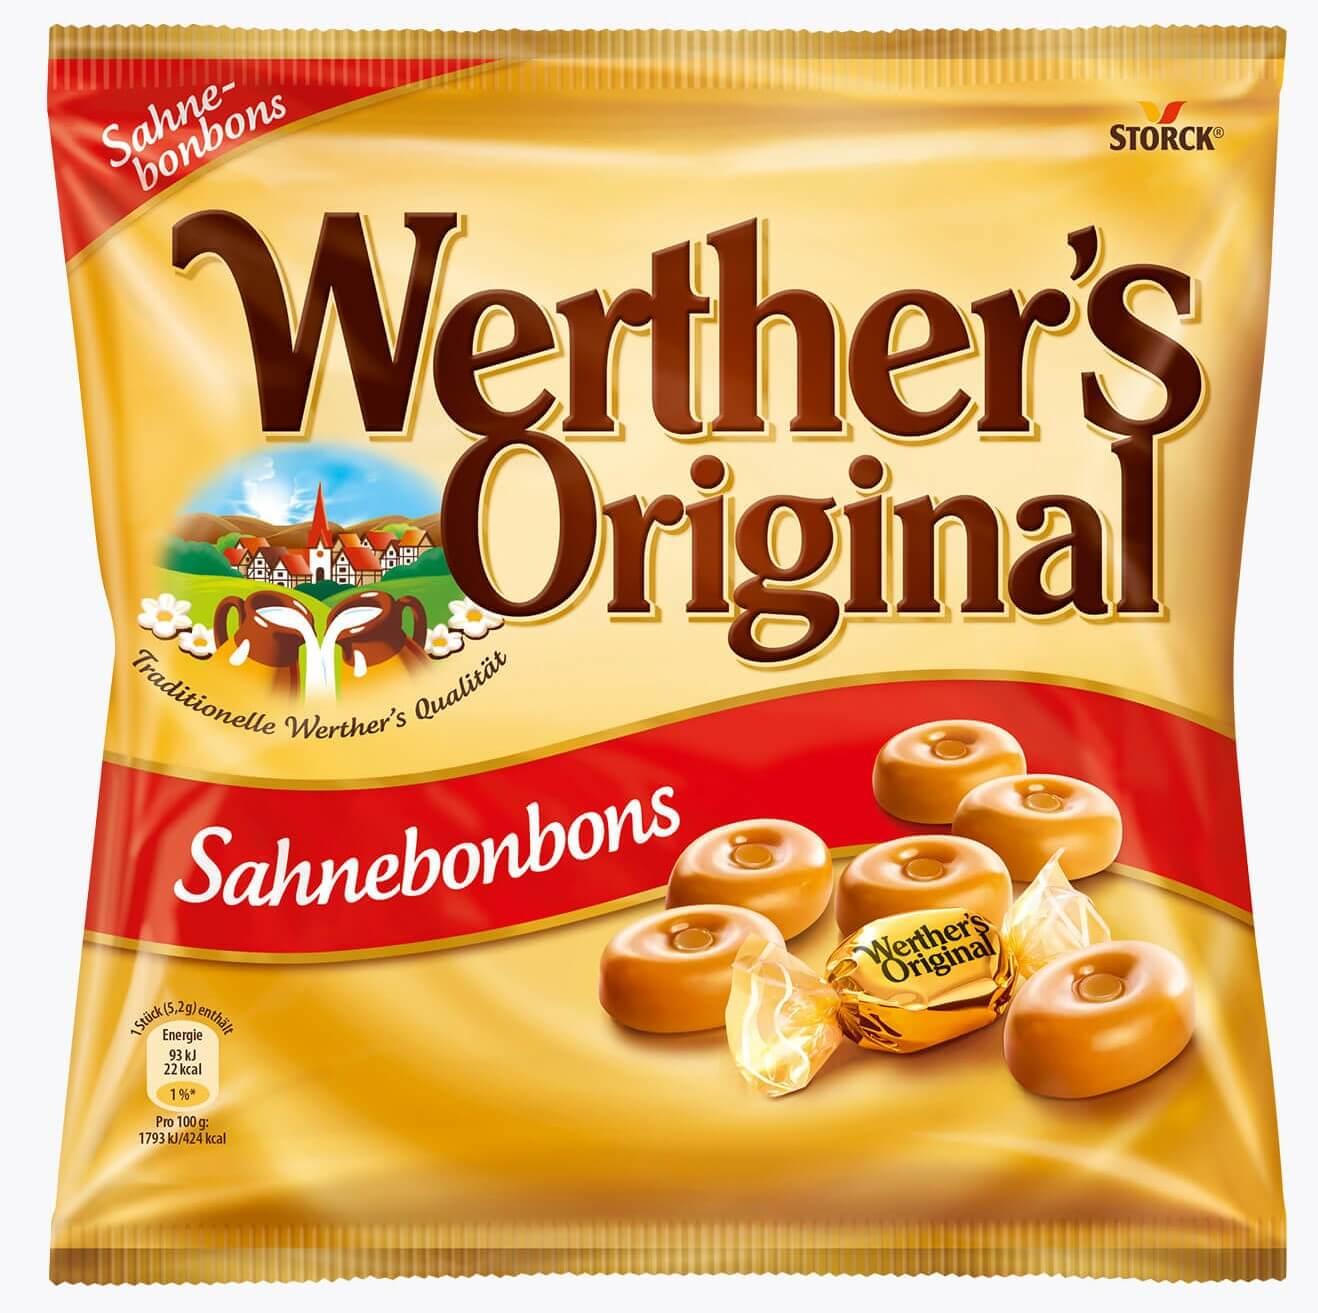 Werthers Original Sahnebonbons